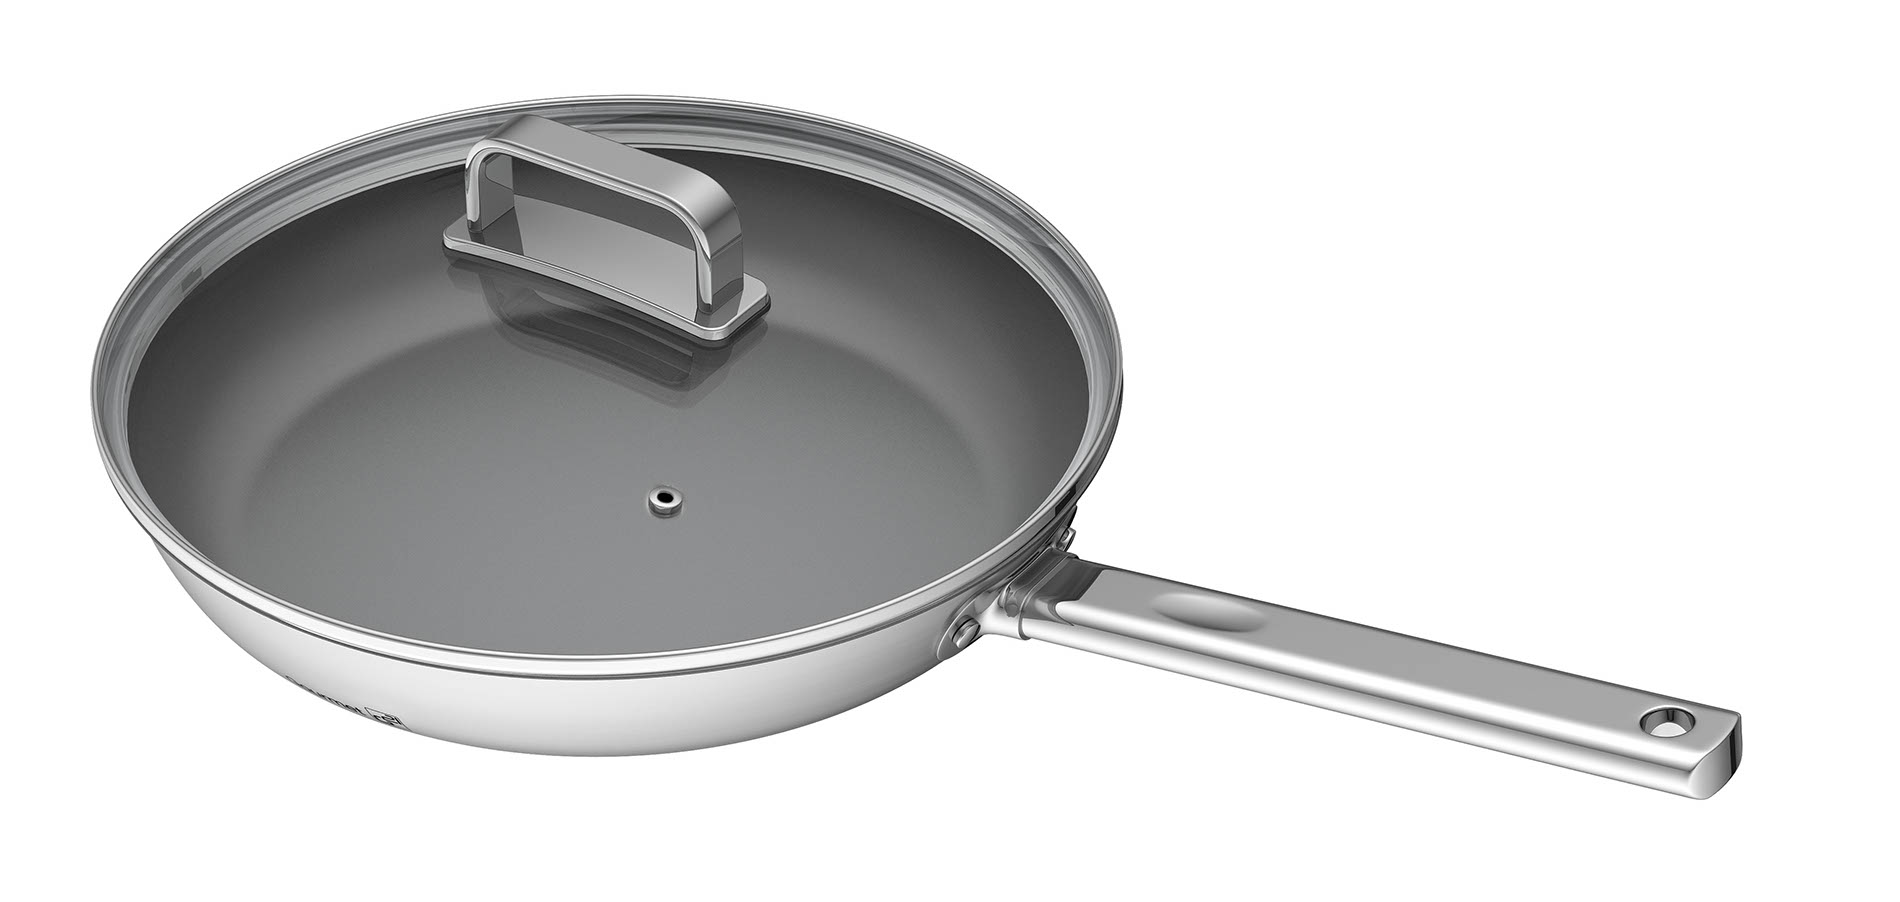 Pánev G21 Gourmet Magic 28 cm s poklicí, nerez